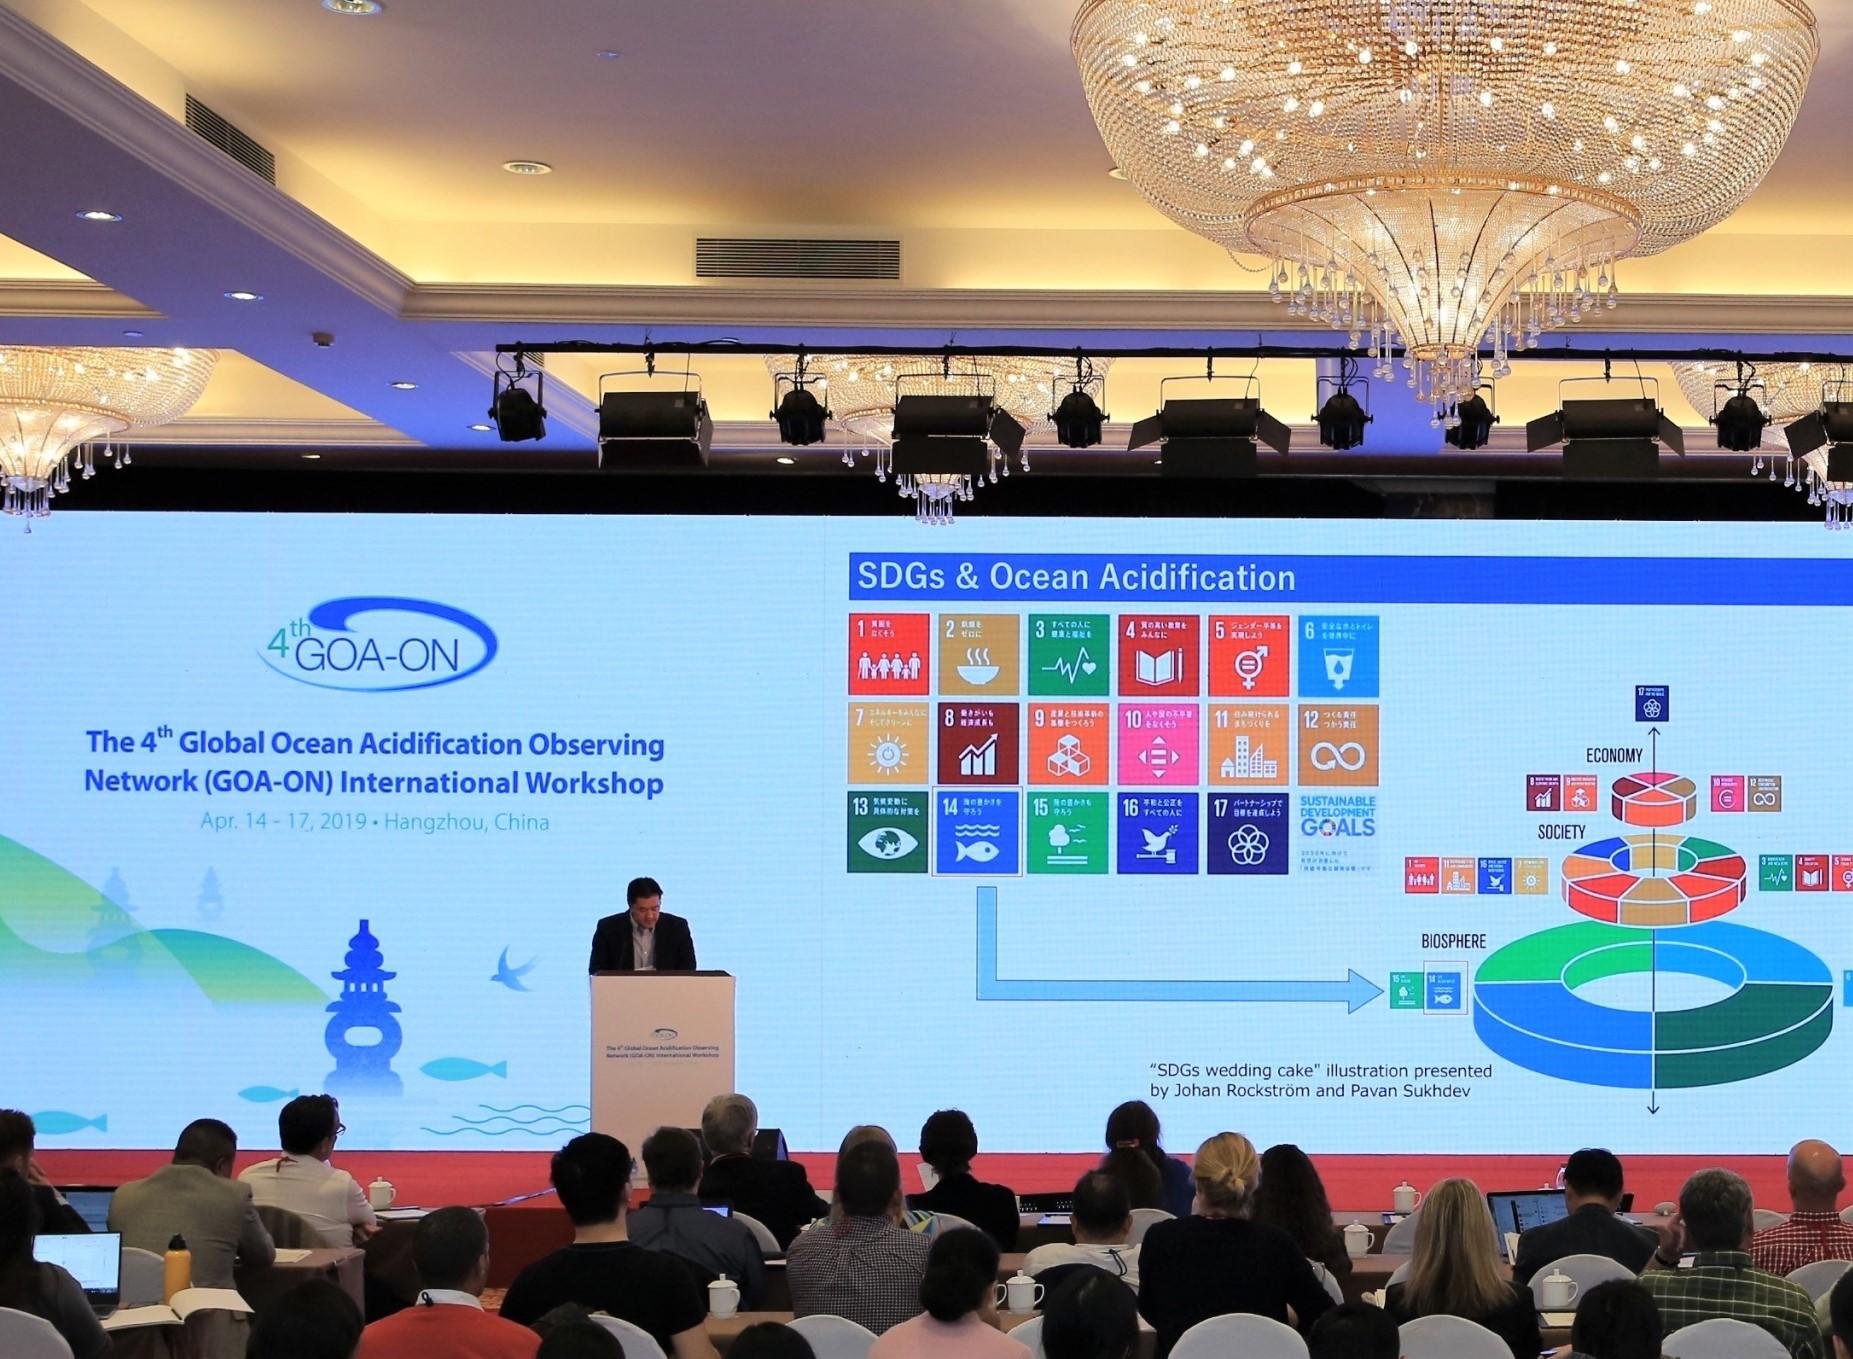 Presentation at an international workshop on ocean acidification (GOA-ON workshop 2019)